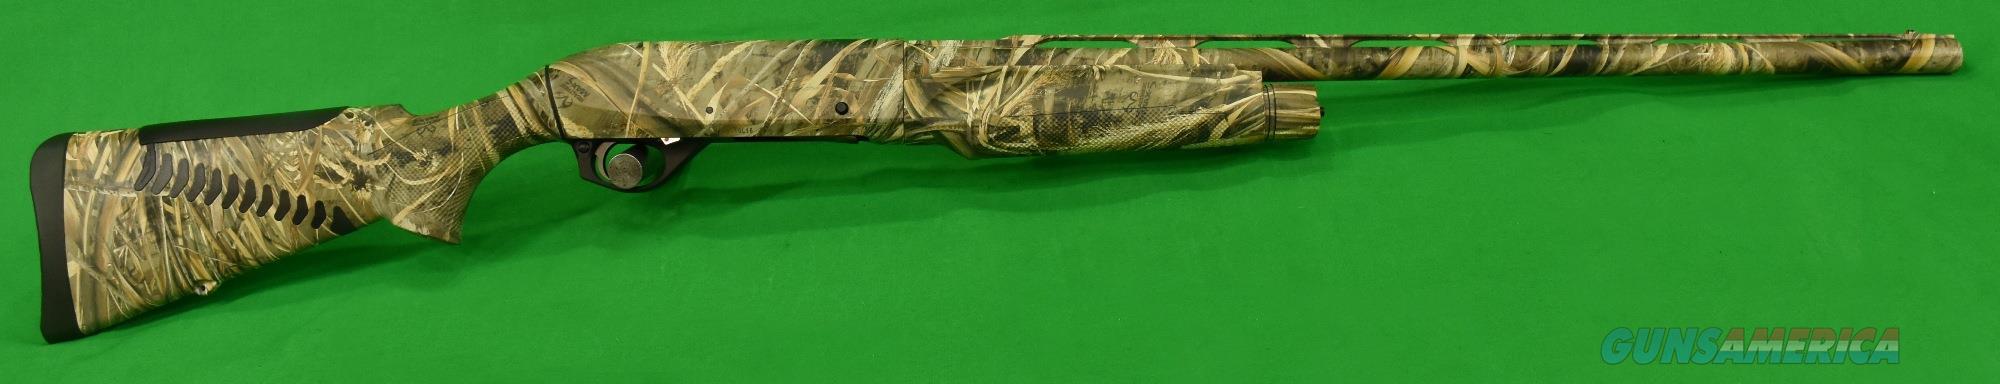 11121 Benelli M2 Field Max-5 Camo Left Hand 12 Ga 28-3In  Guns > Shotguns > Benelli Shotguns > Sporting